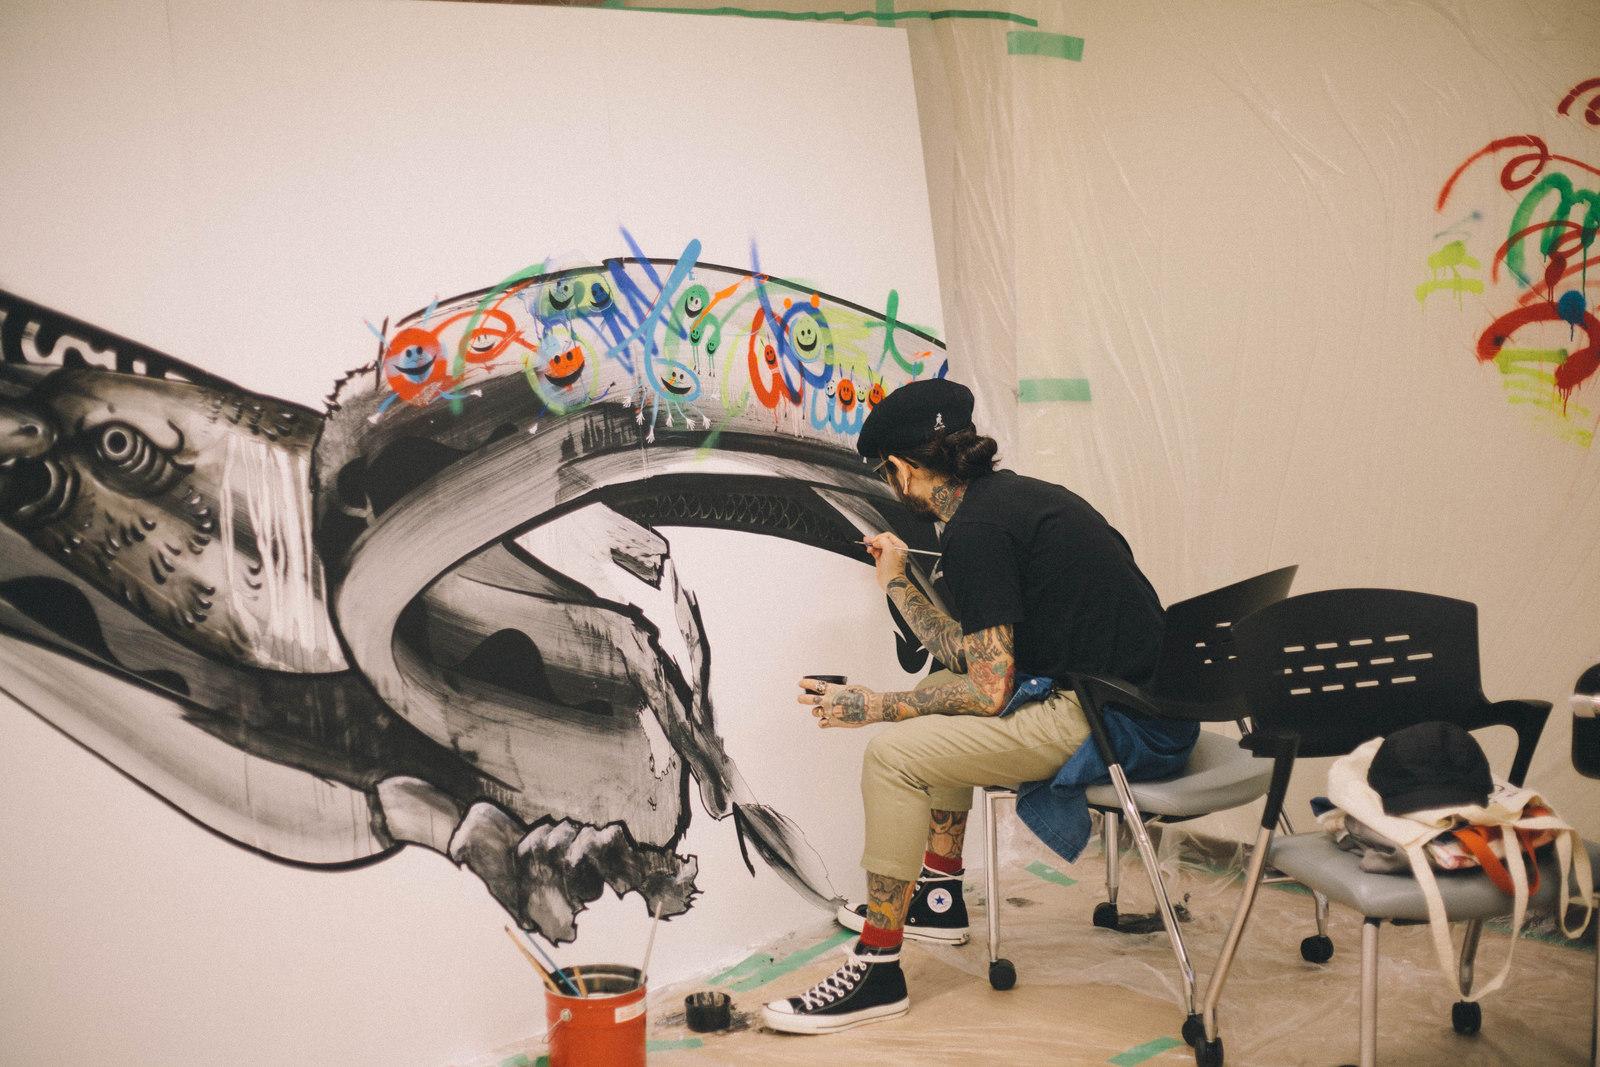 IMG_1339 国内外で活躍するアーティスト4組の「作品の向こう側」| ジャーナル スタンダード「オムニバス展」密着レポート!